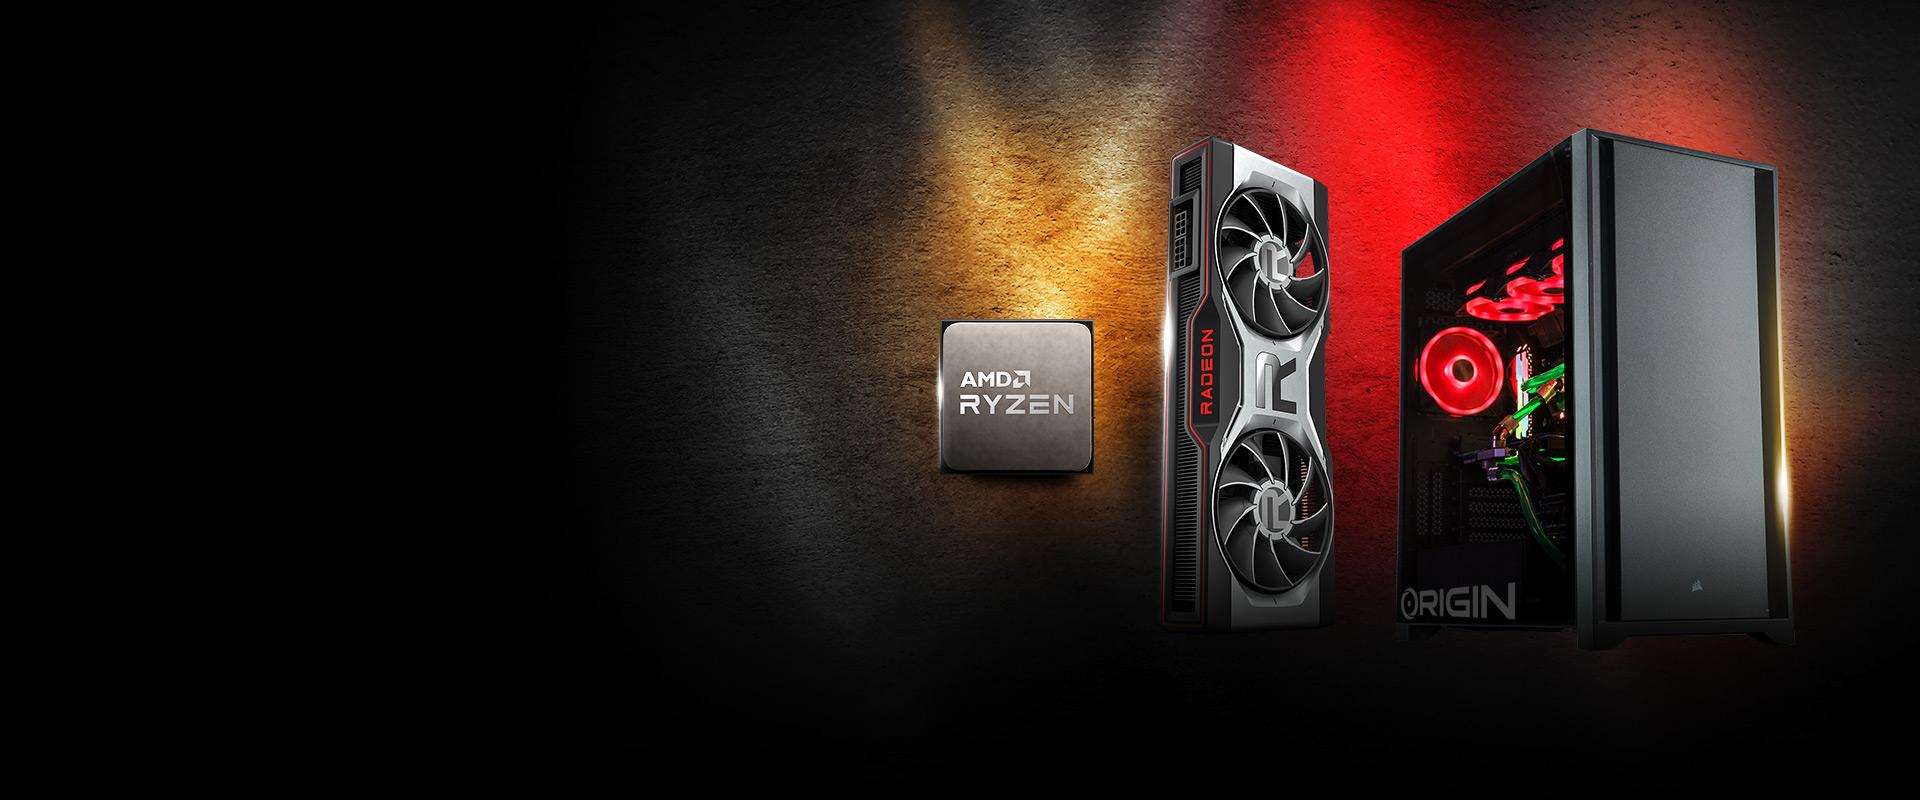 AMD Radeon 6700 XT Available Now